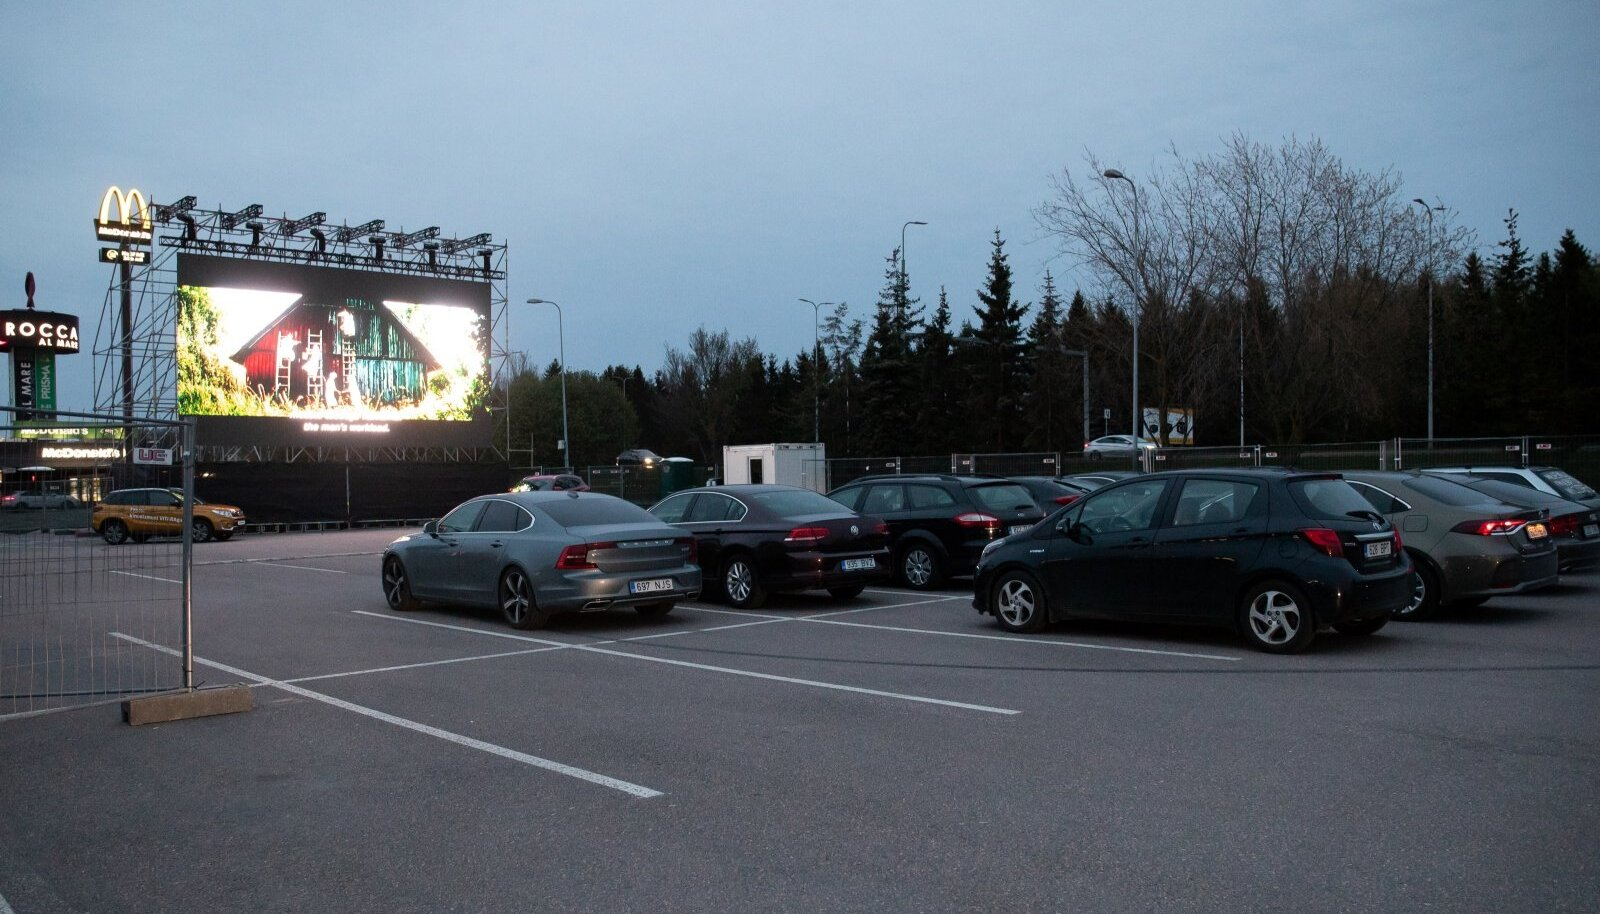 Tallinn, 15.05.2020. Drive-In kino Rocca Al Mares.